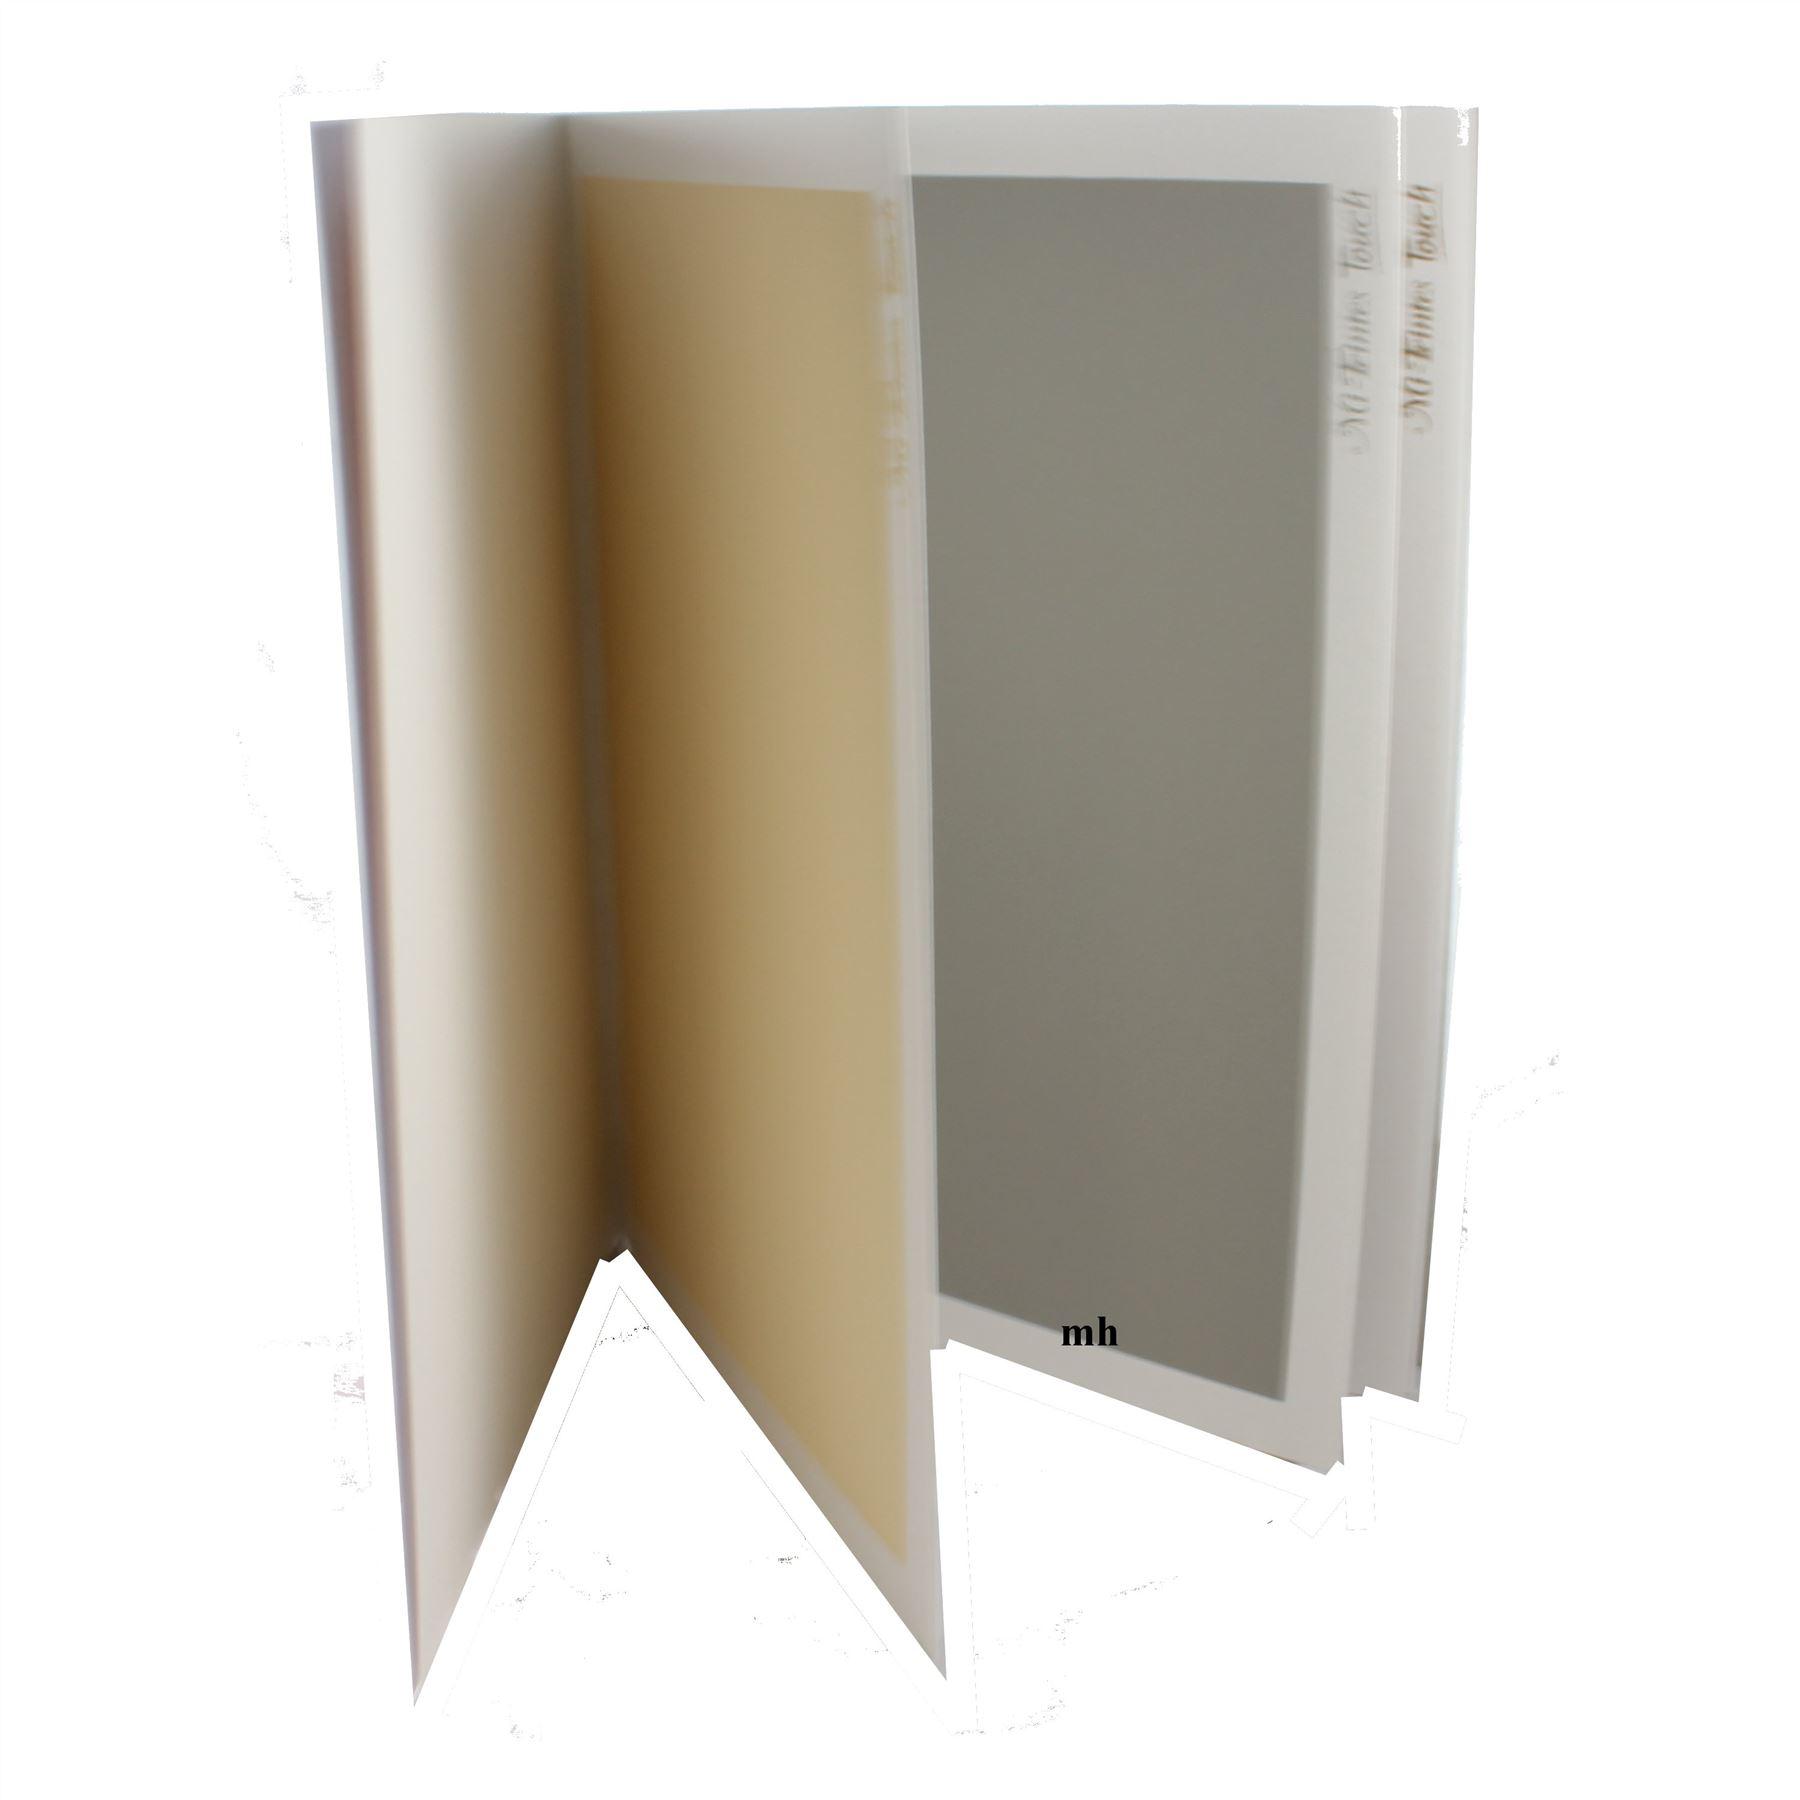 sand-paper-texture-pastel-paper-canson-Mi-Teintes-touch-soft-pastel-pad thumbnail 3